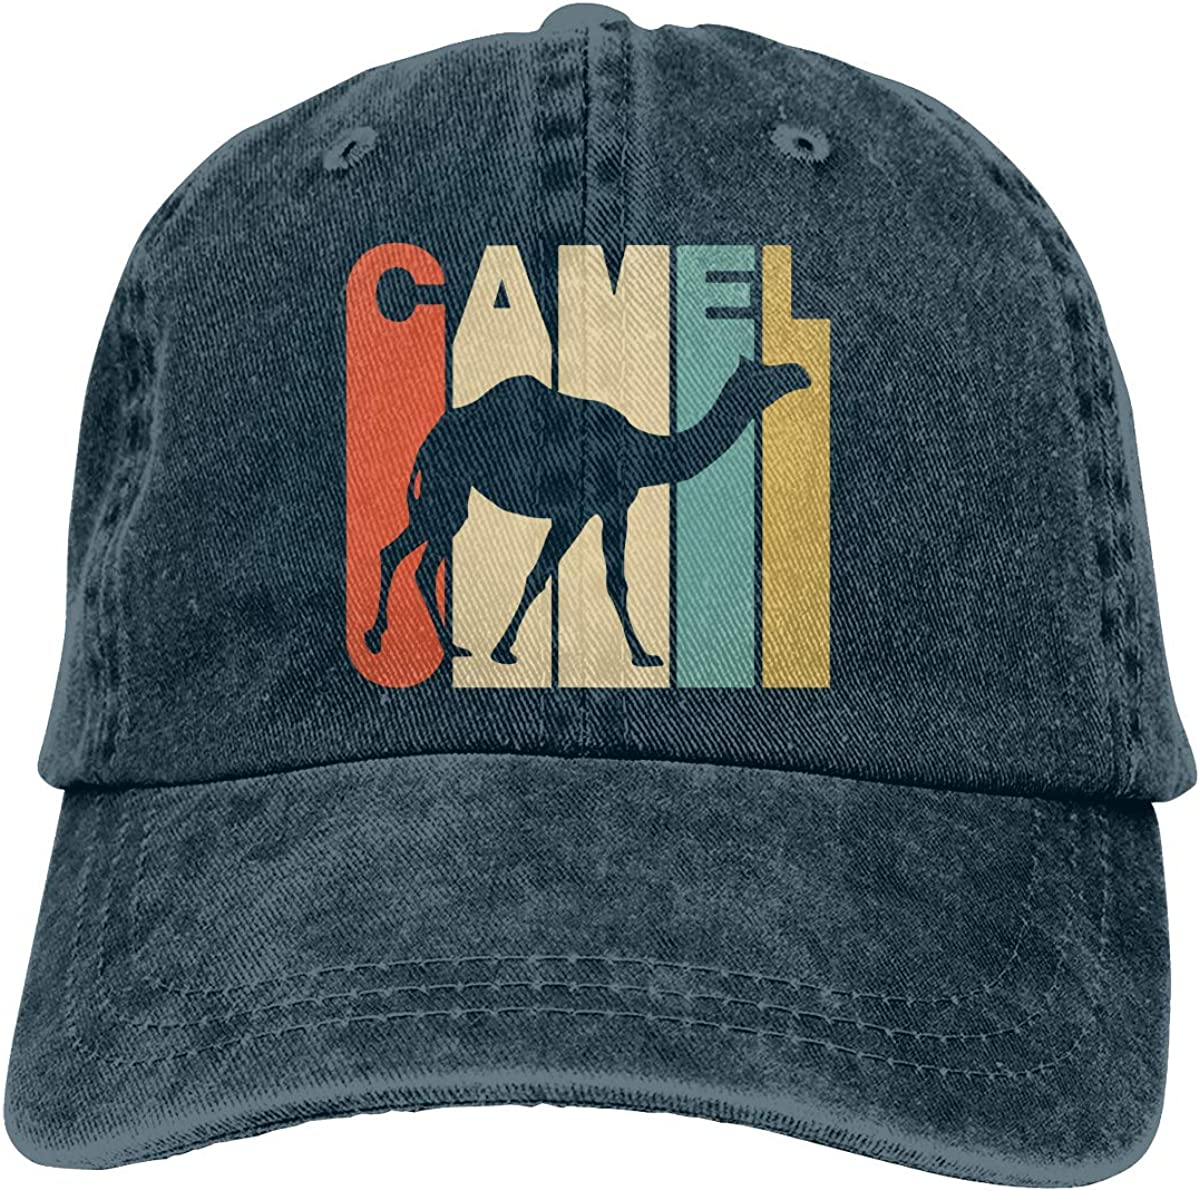 Vintage Style Camel Unisex Personalize Cowboy Casquette Adjustable Baseball Cap